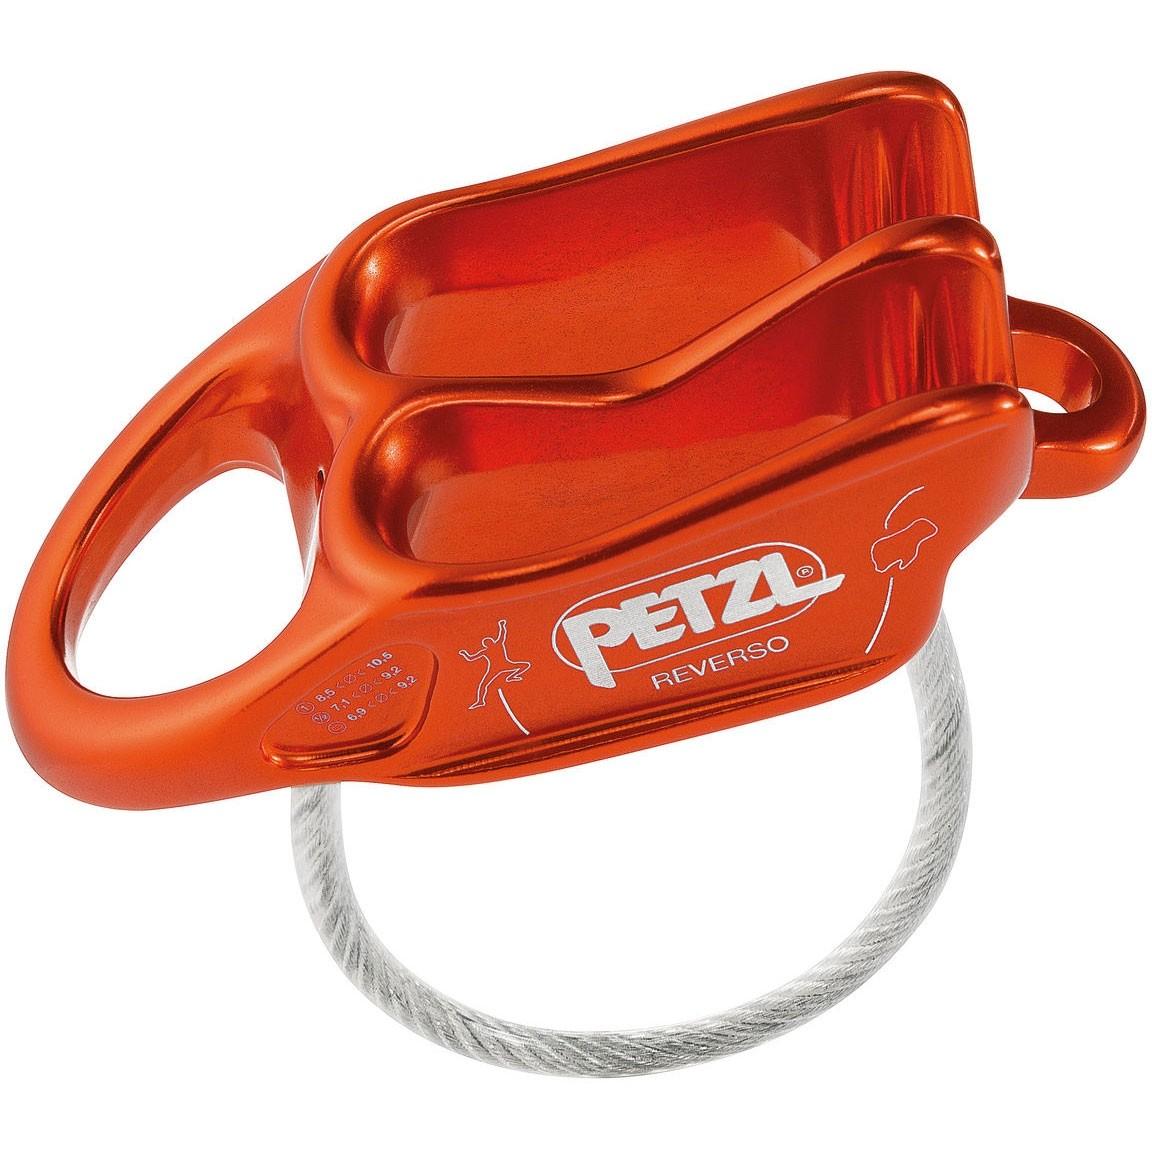 Petzl Reverso Belay Device - Red/Orange